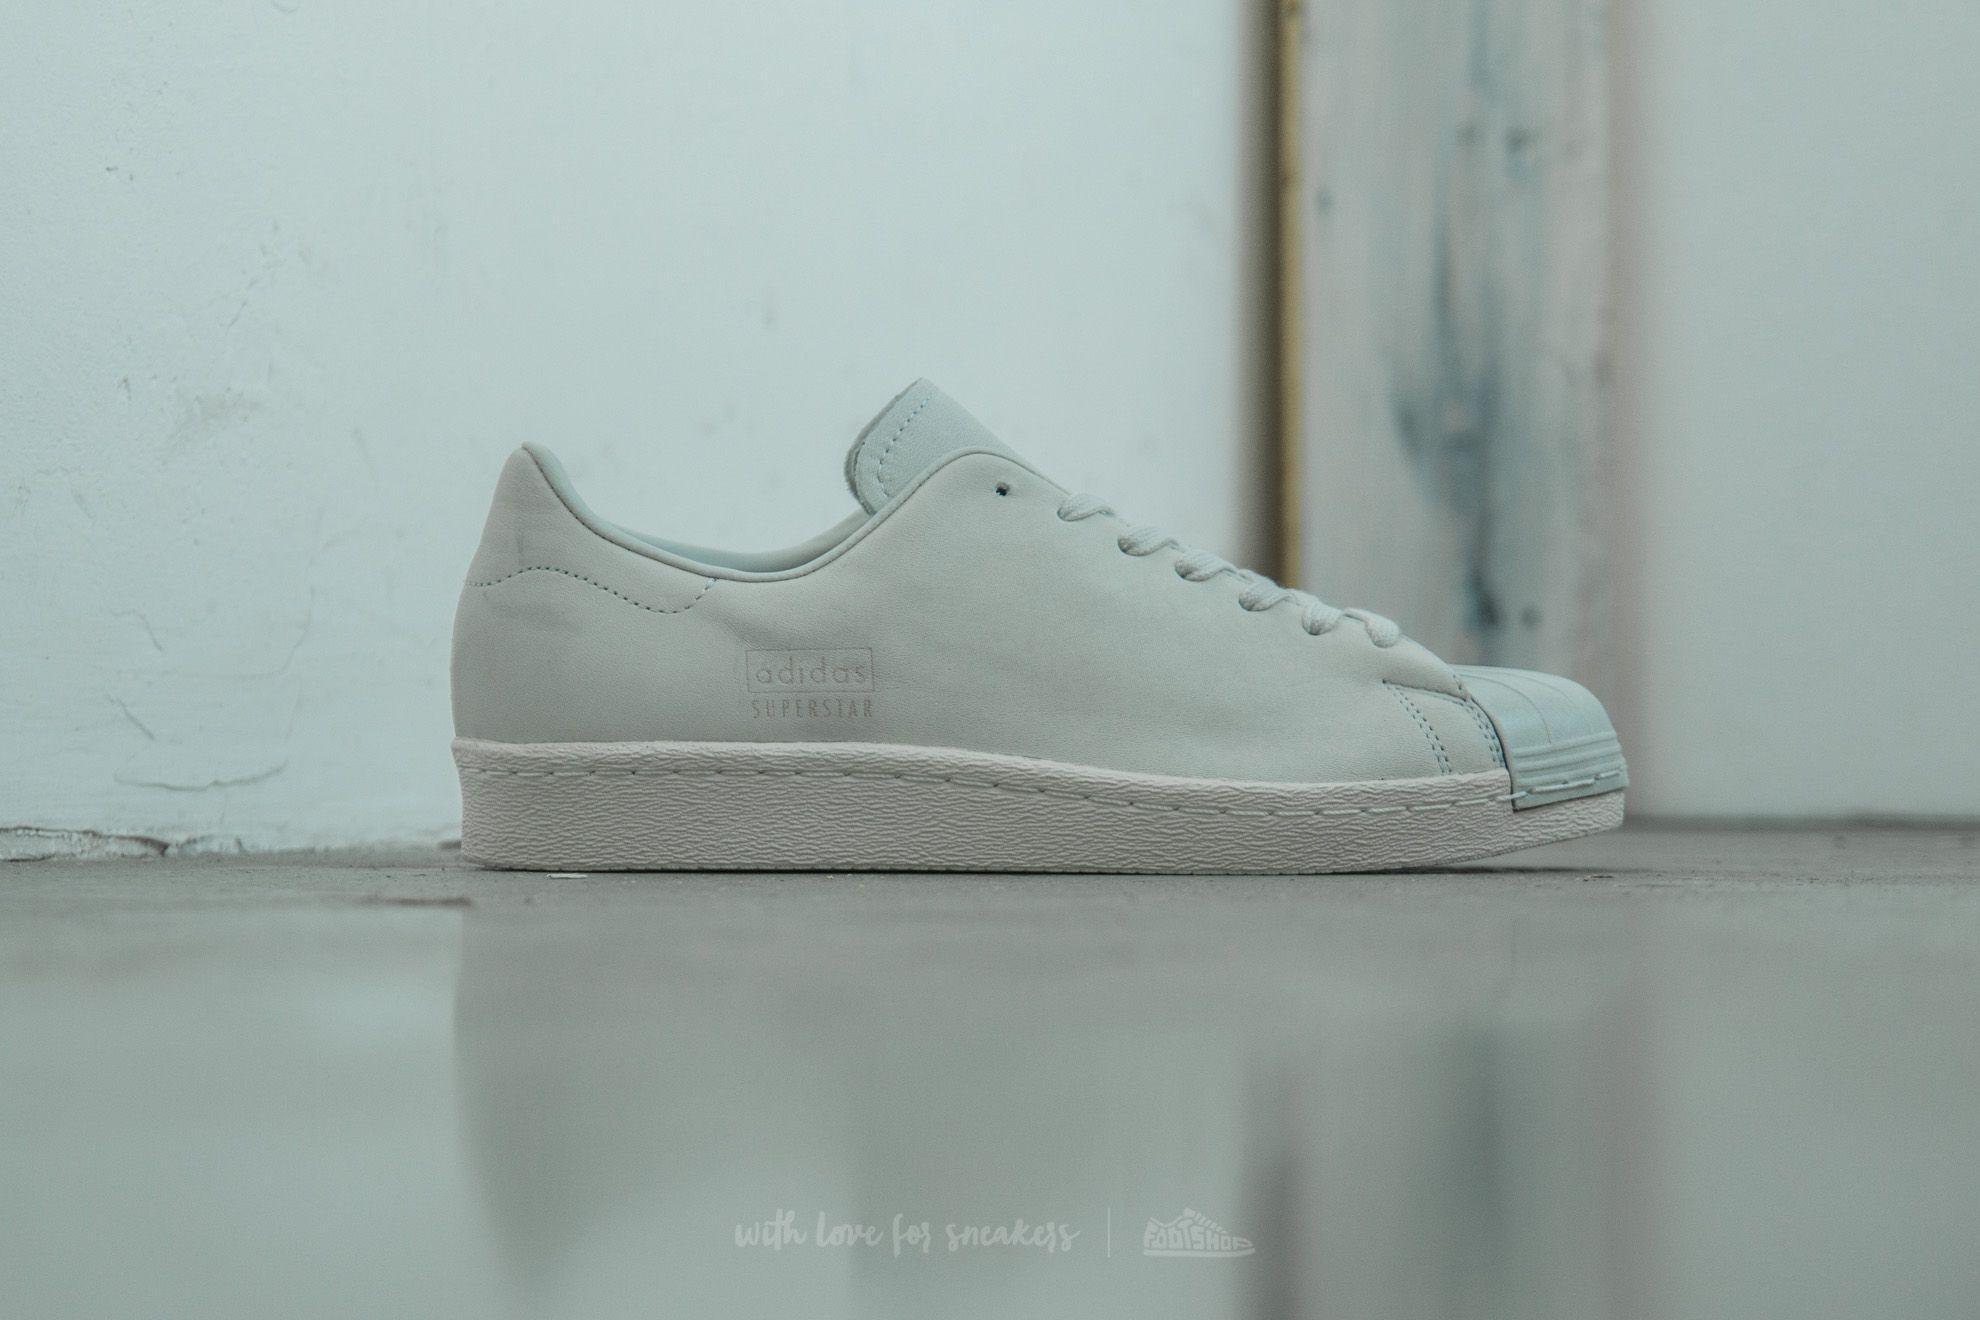 ed7e45f7759 Lyst - adidas Originals Adidas Superstar 80s Clean Crystal White ...